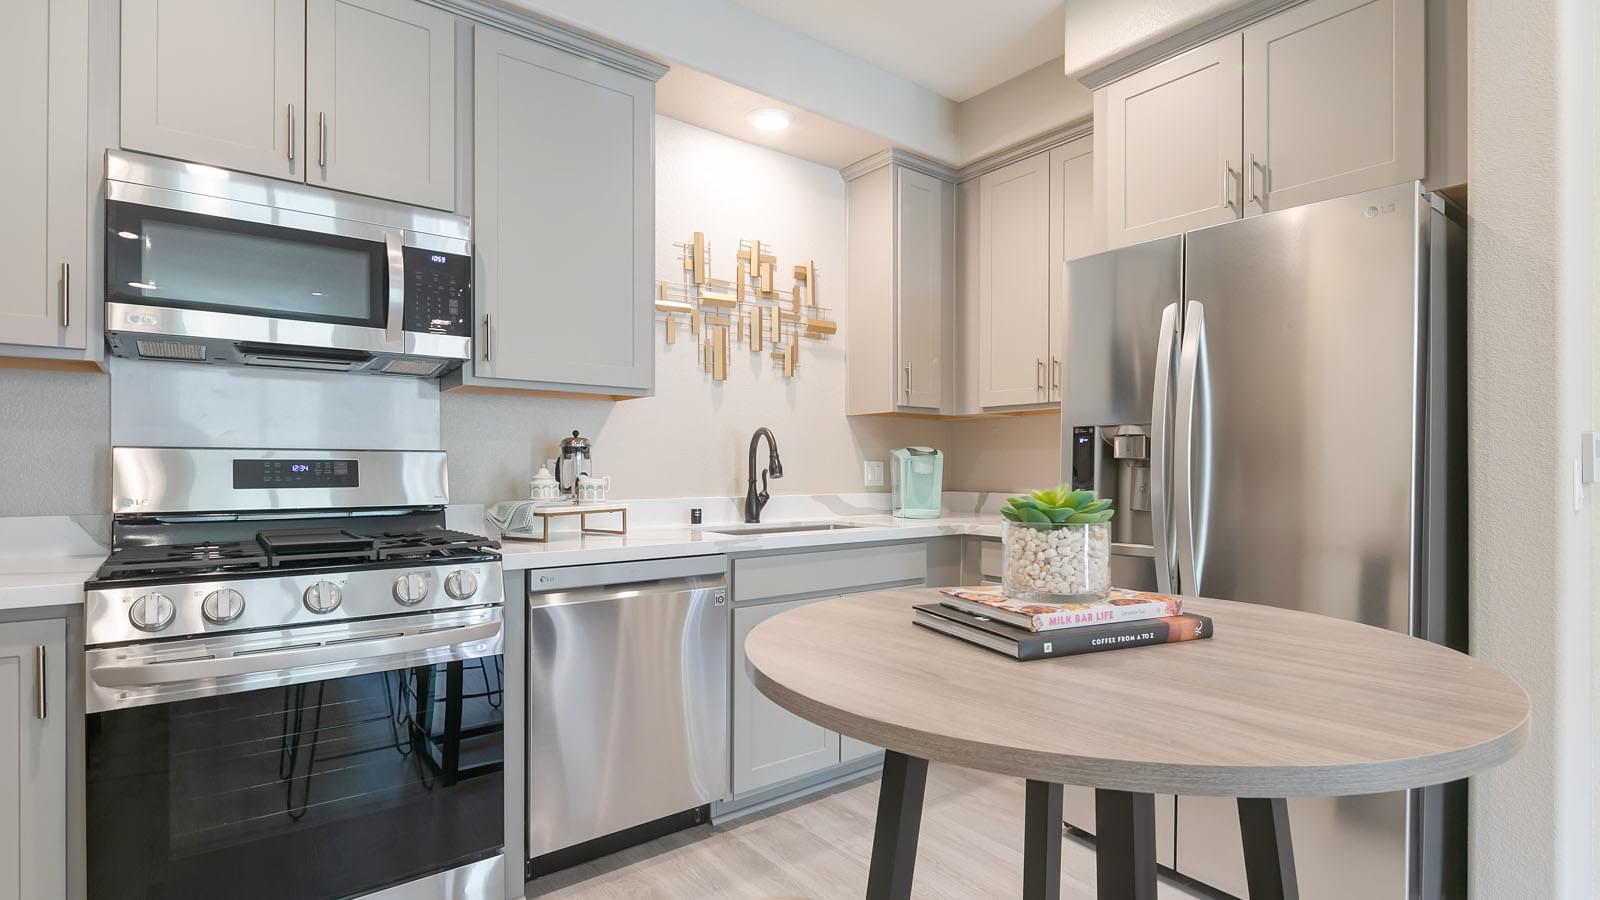 Residence 1 DeNova Homes Floorplan